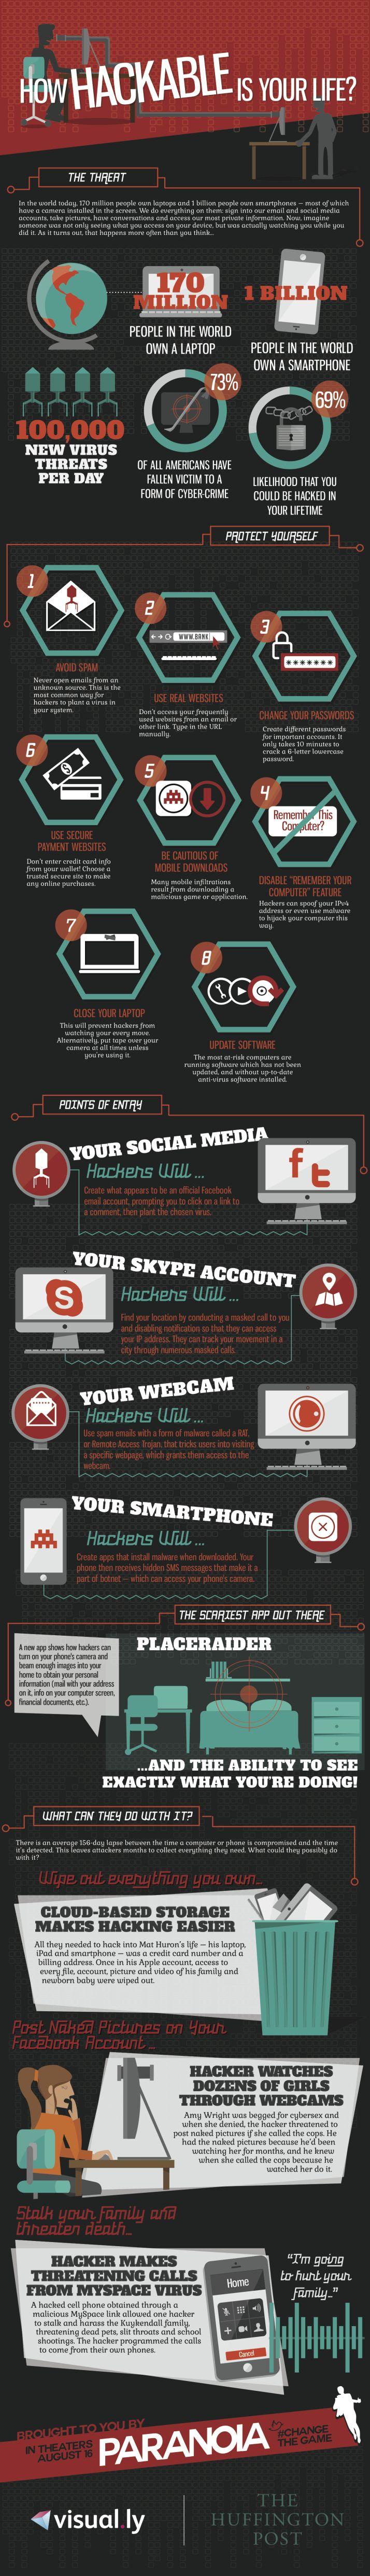 ¿Tu vida es hackeable? #infografia